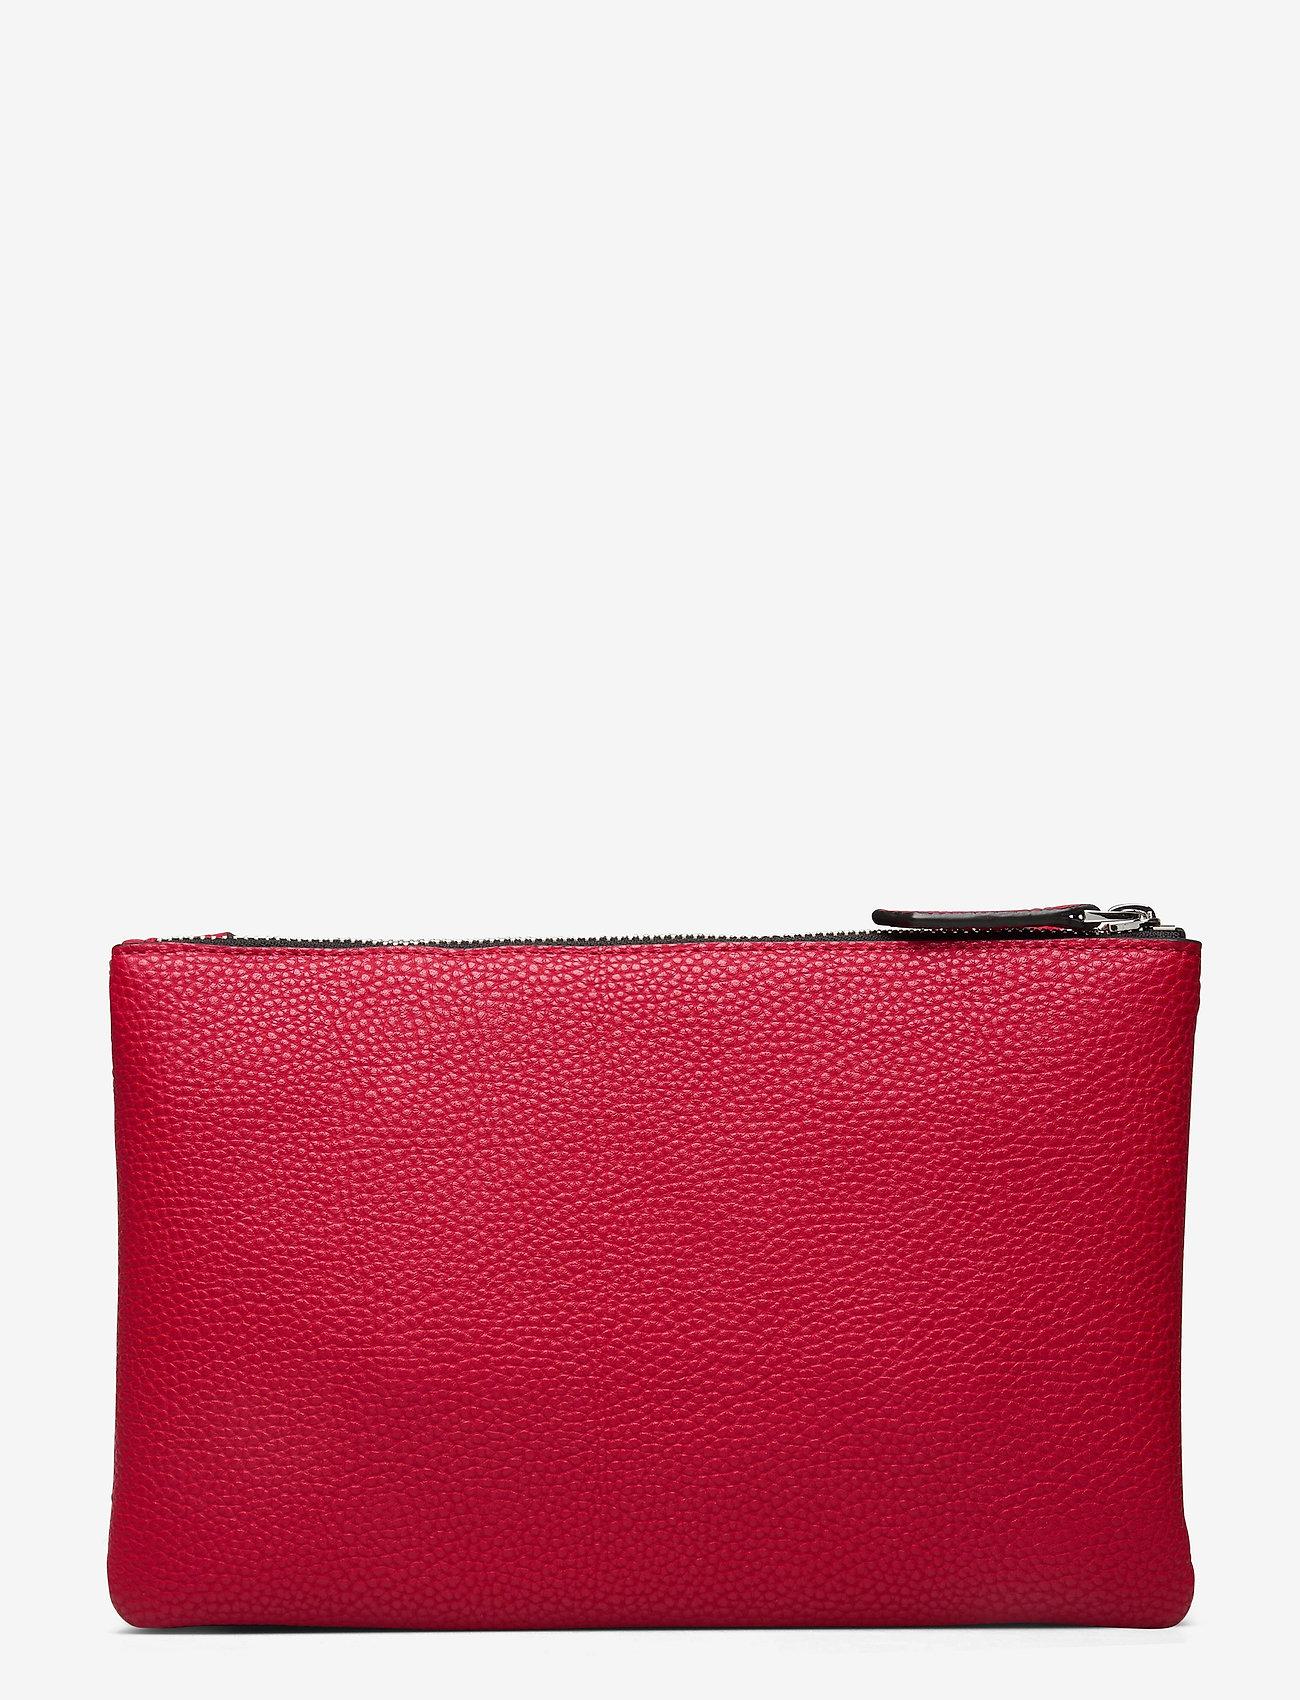 Calvin Klein Ck Everyday Duo Crossbody - Shoulder Bags